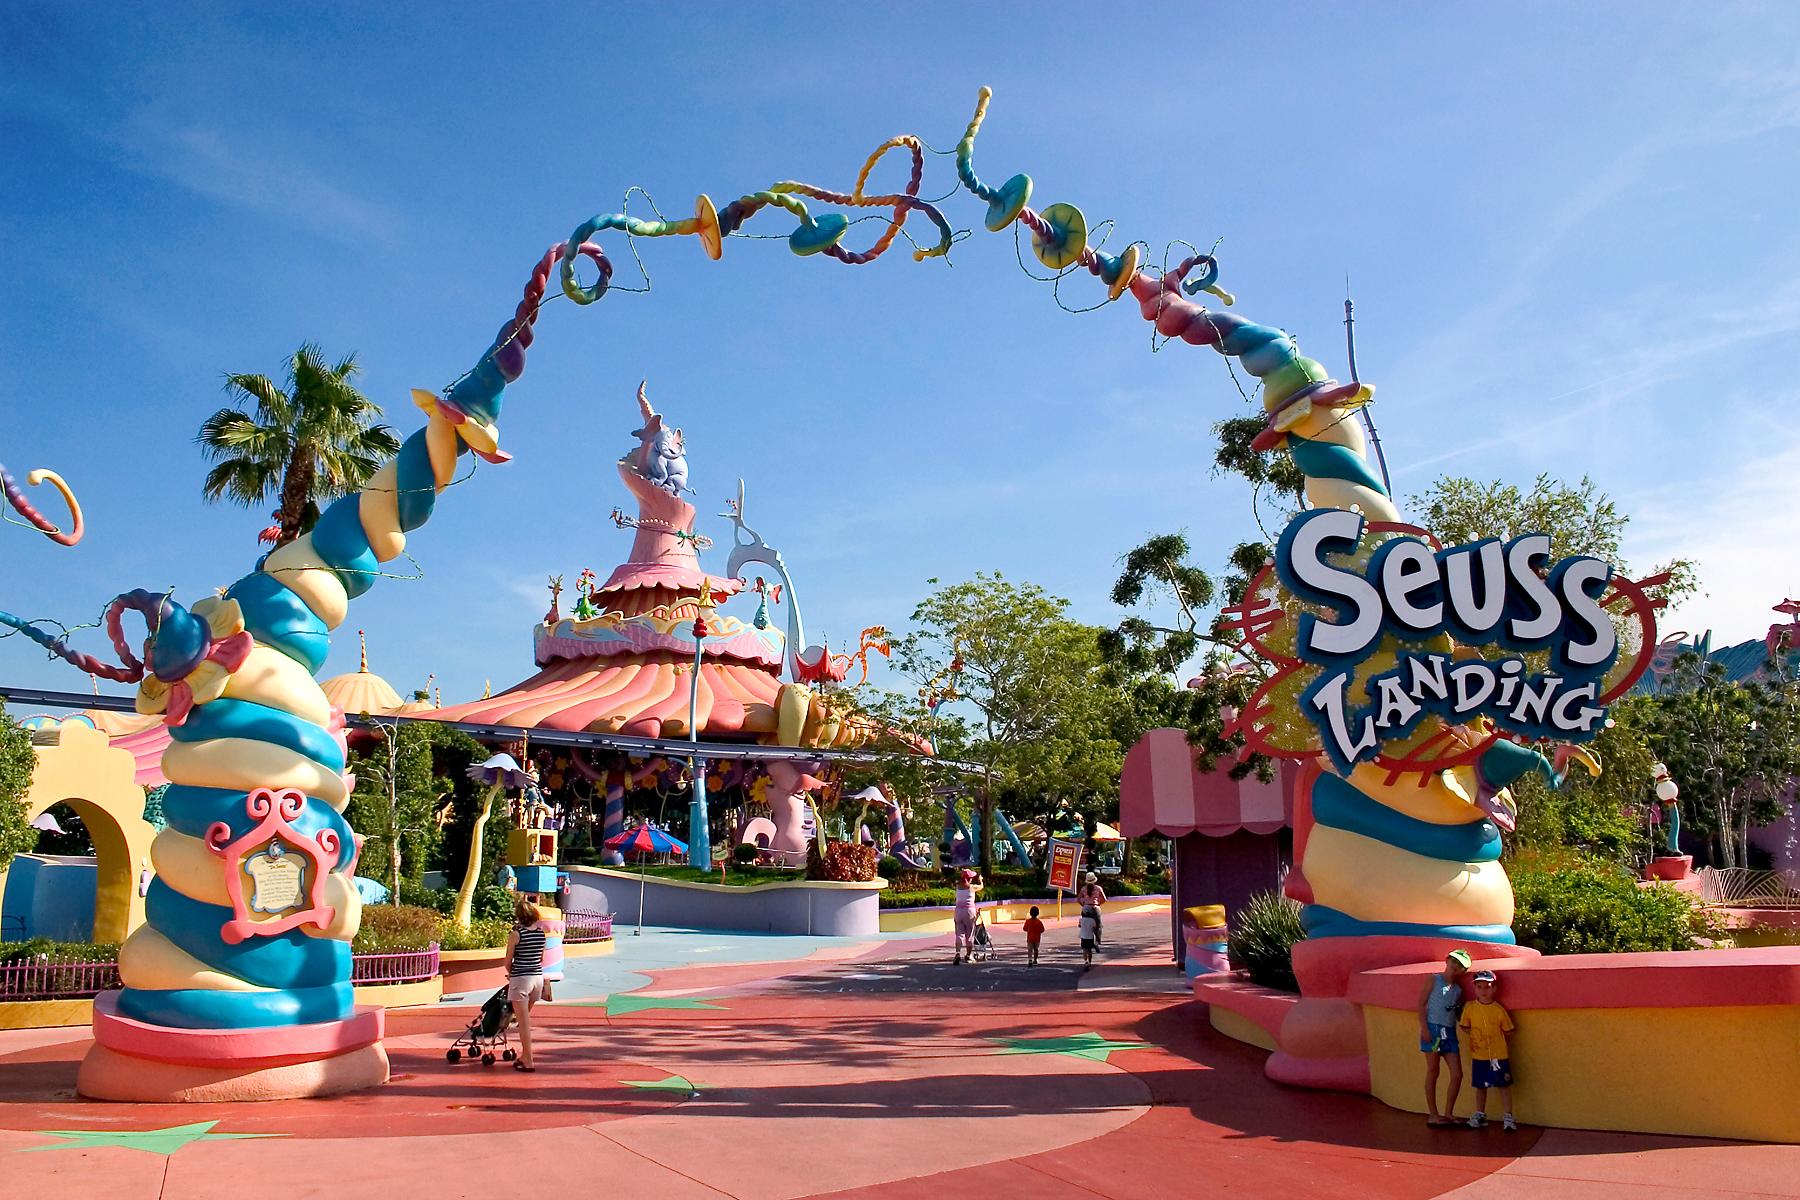 Seuss Landing at Islands of Adventure in Orlando